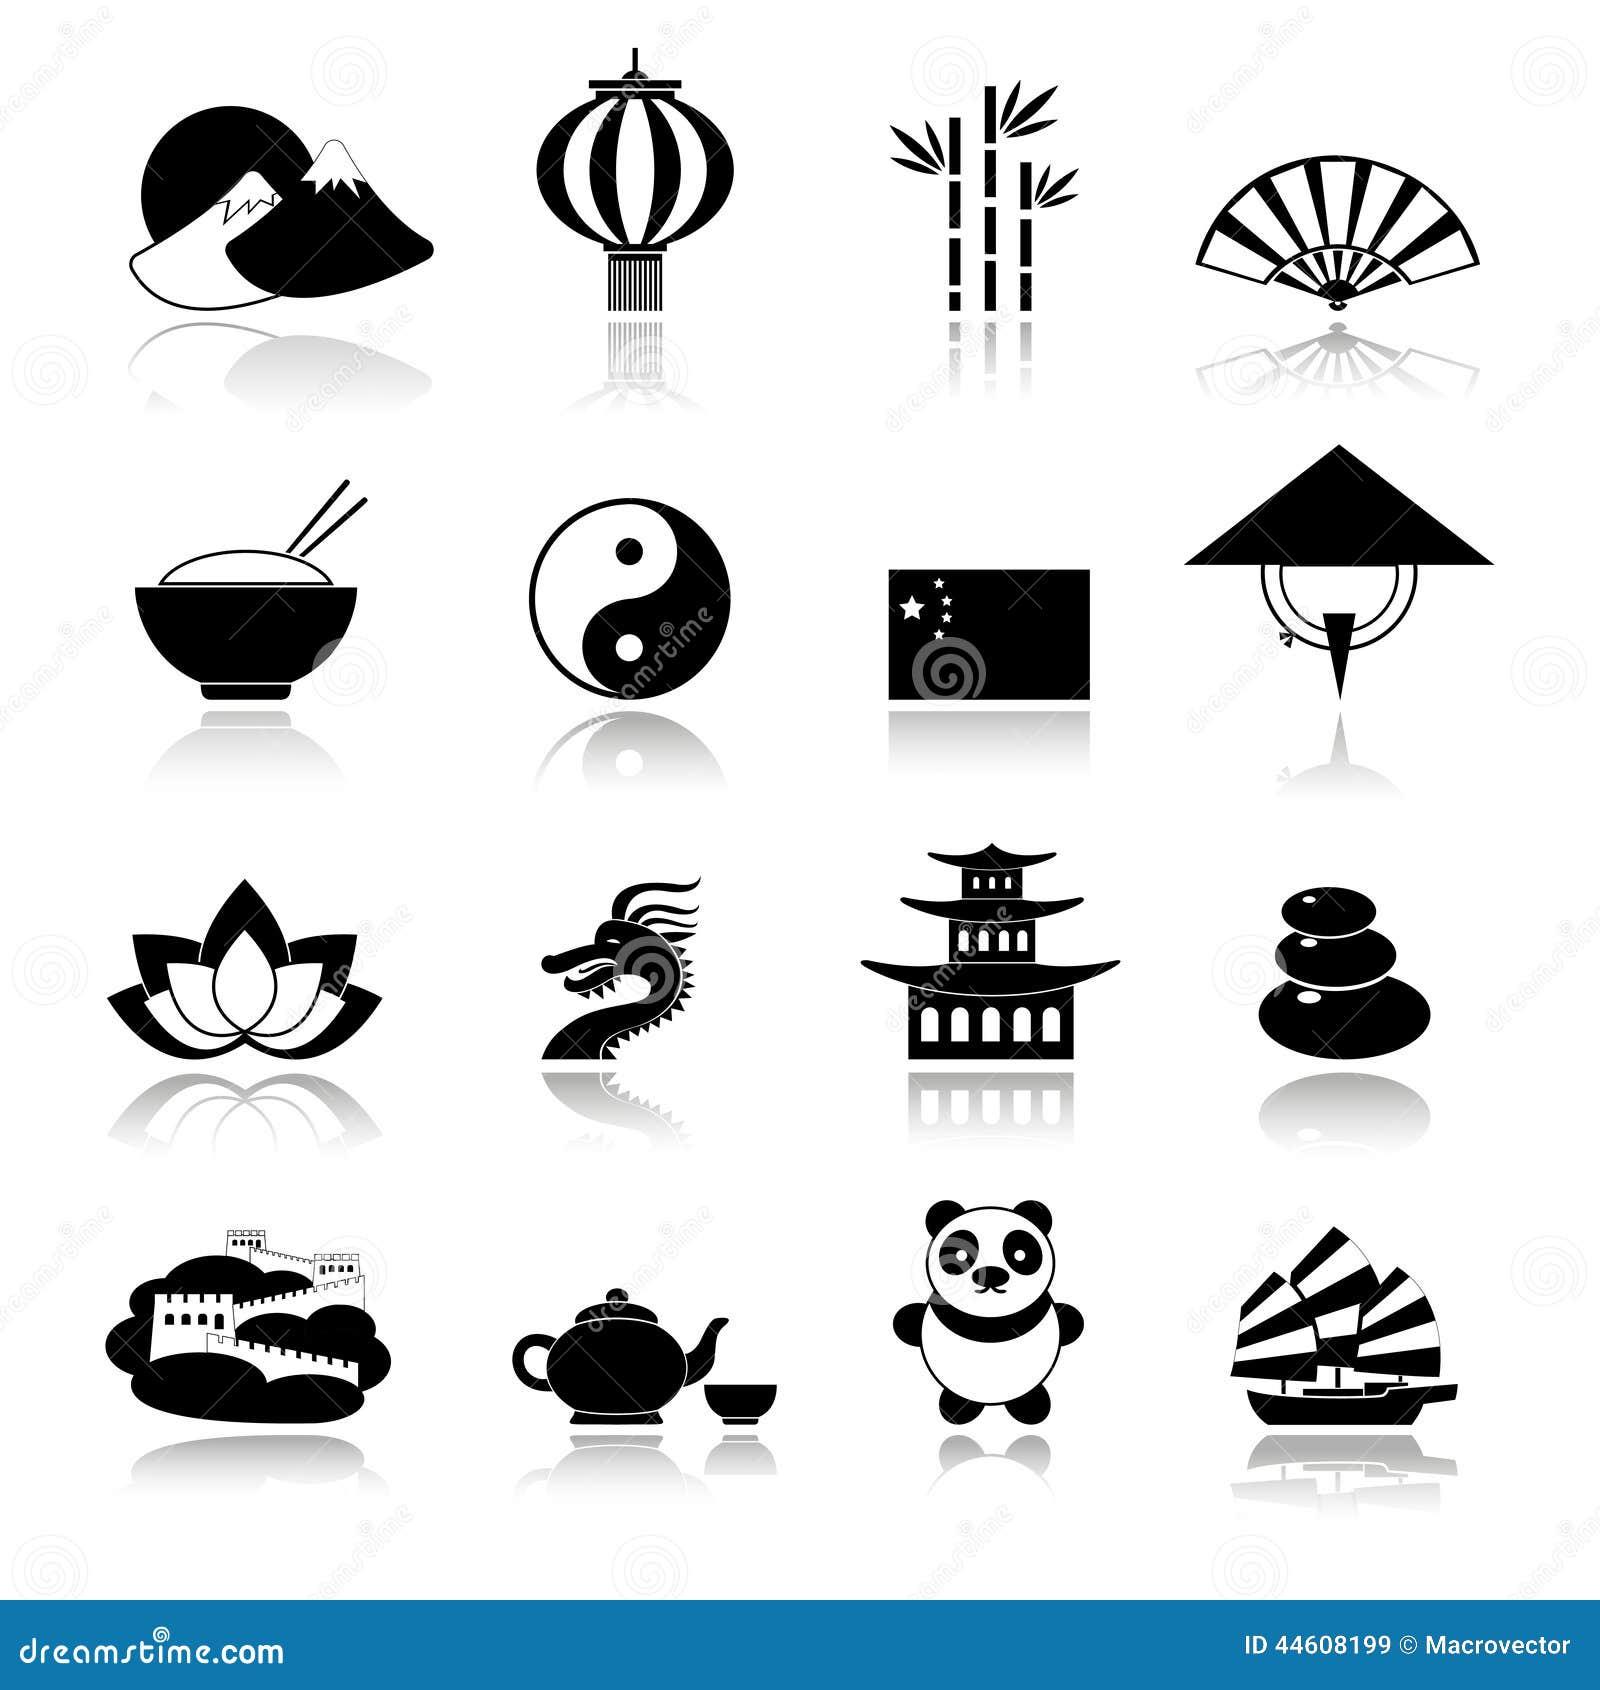 China Icons Set Black Stock Vector Illustration Of Internet 44608199